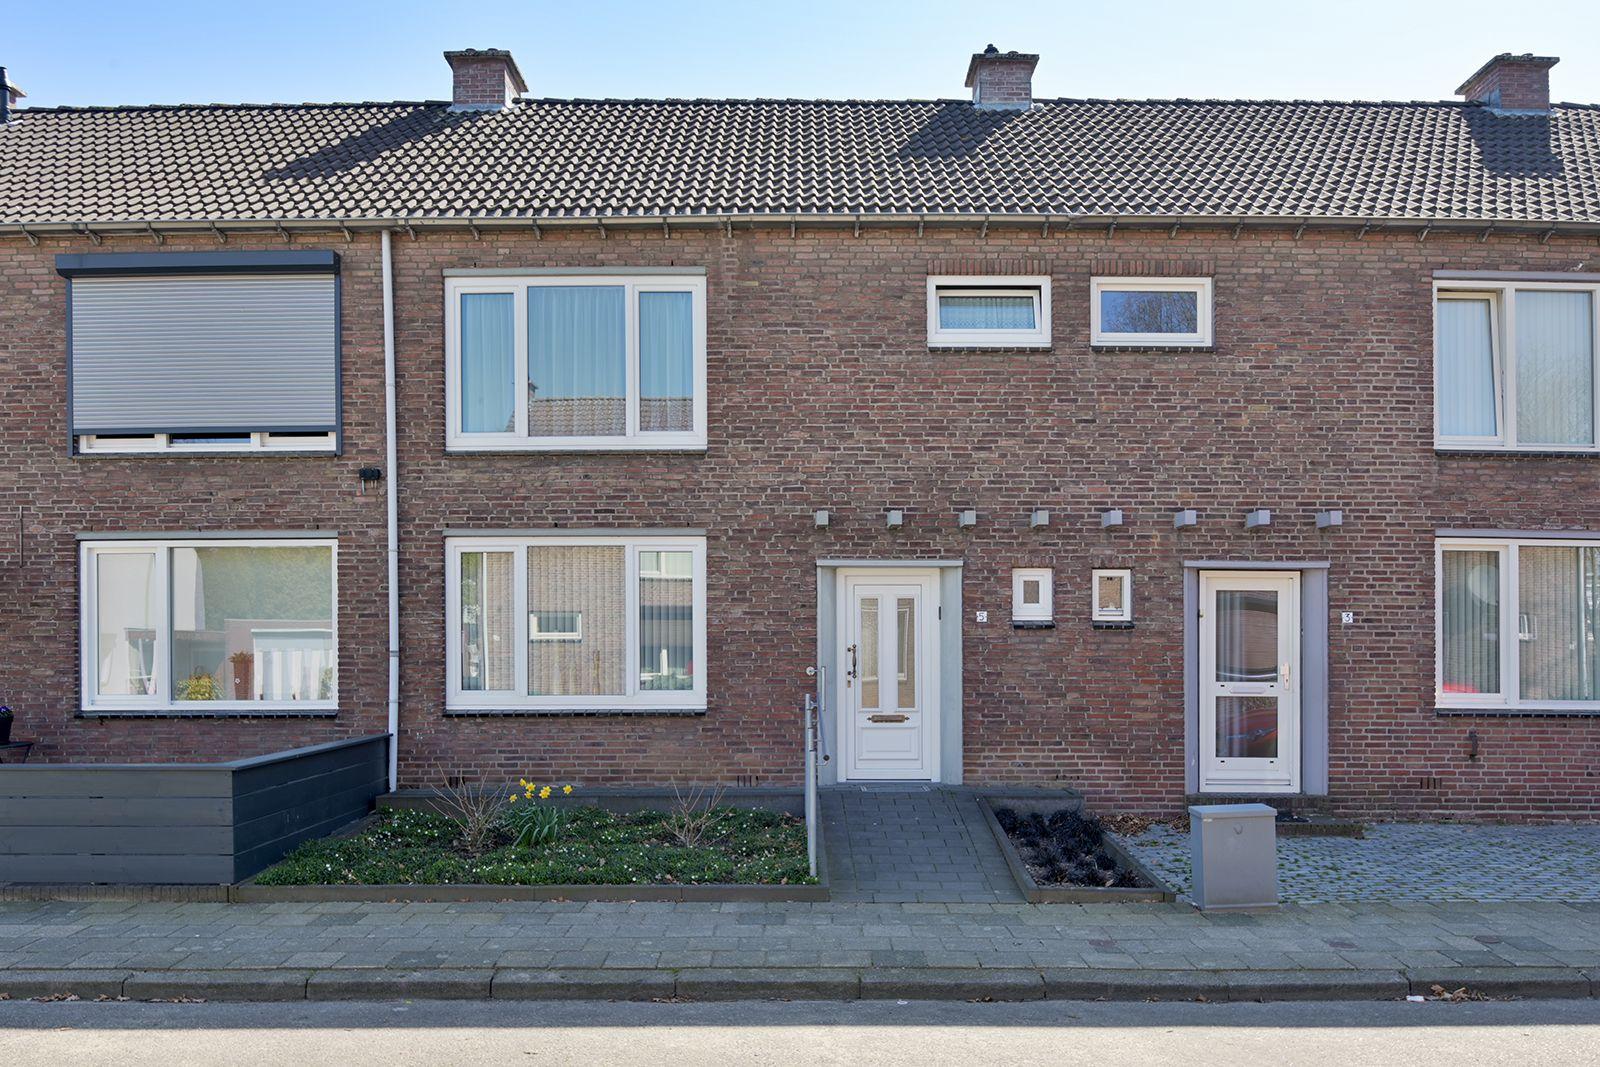 Jan van Eyckstraat 5, Sittard